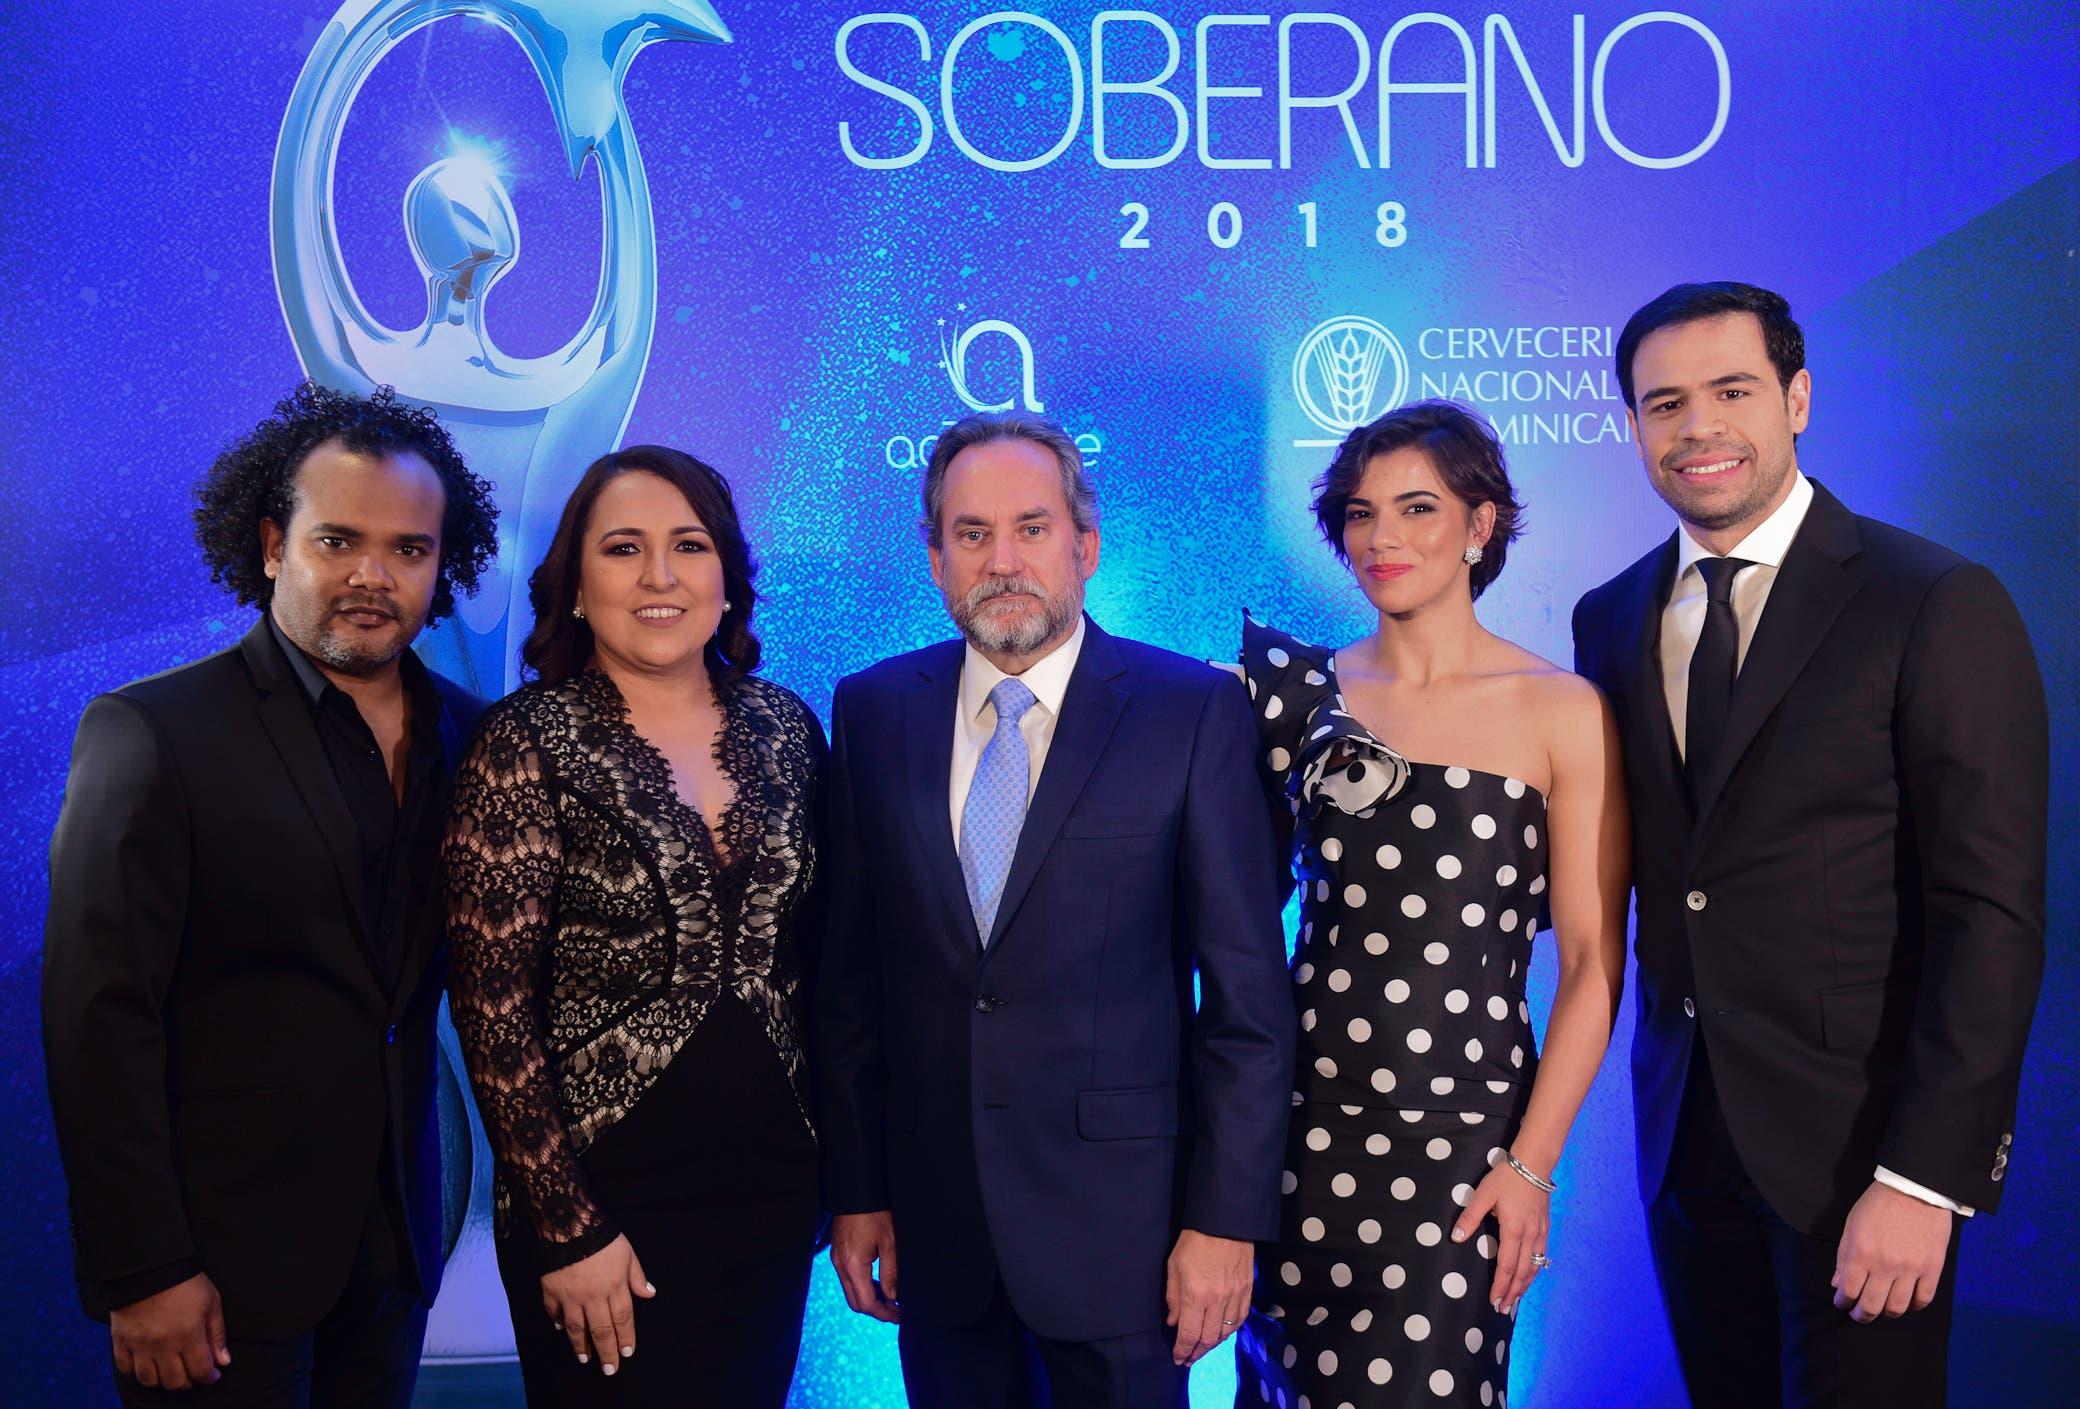 Alberto Zayas, Emelyn Baldera, Franklin León, Nashla Bogaert y Roberto Ángel.